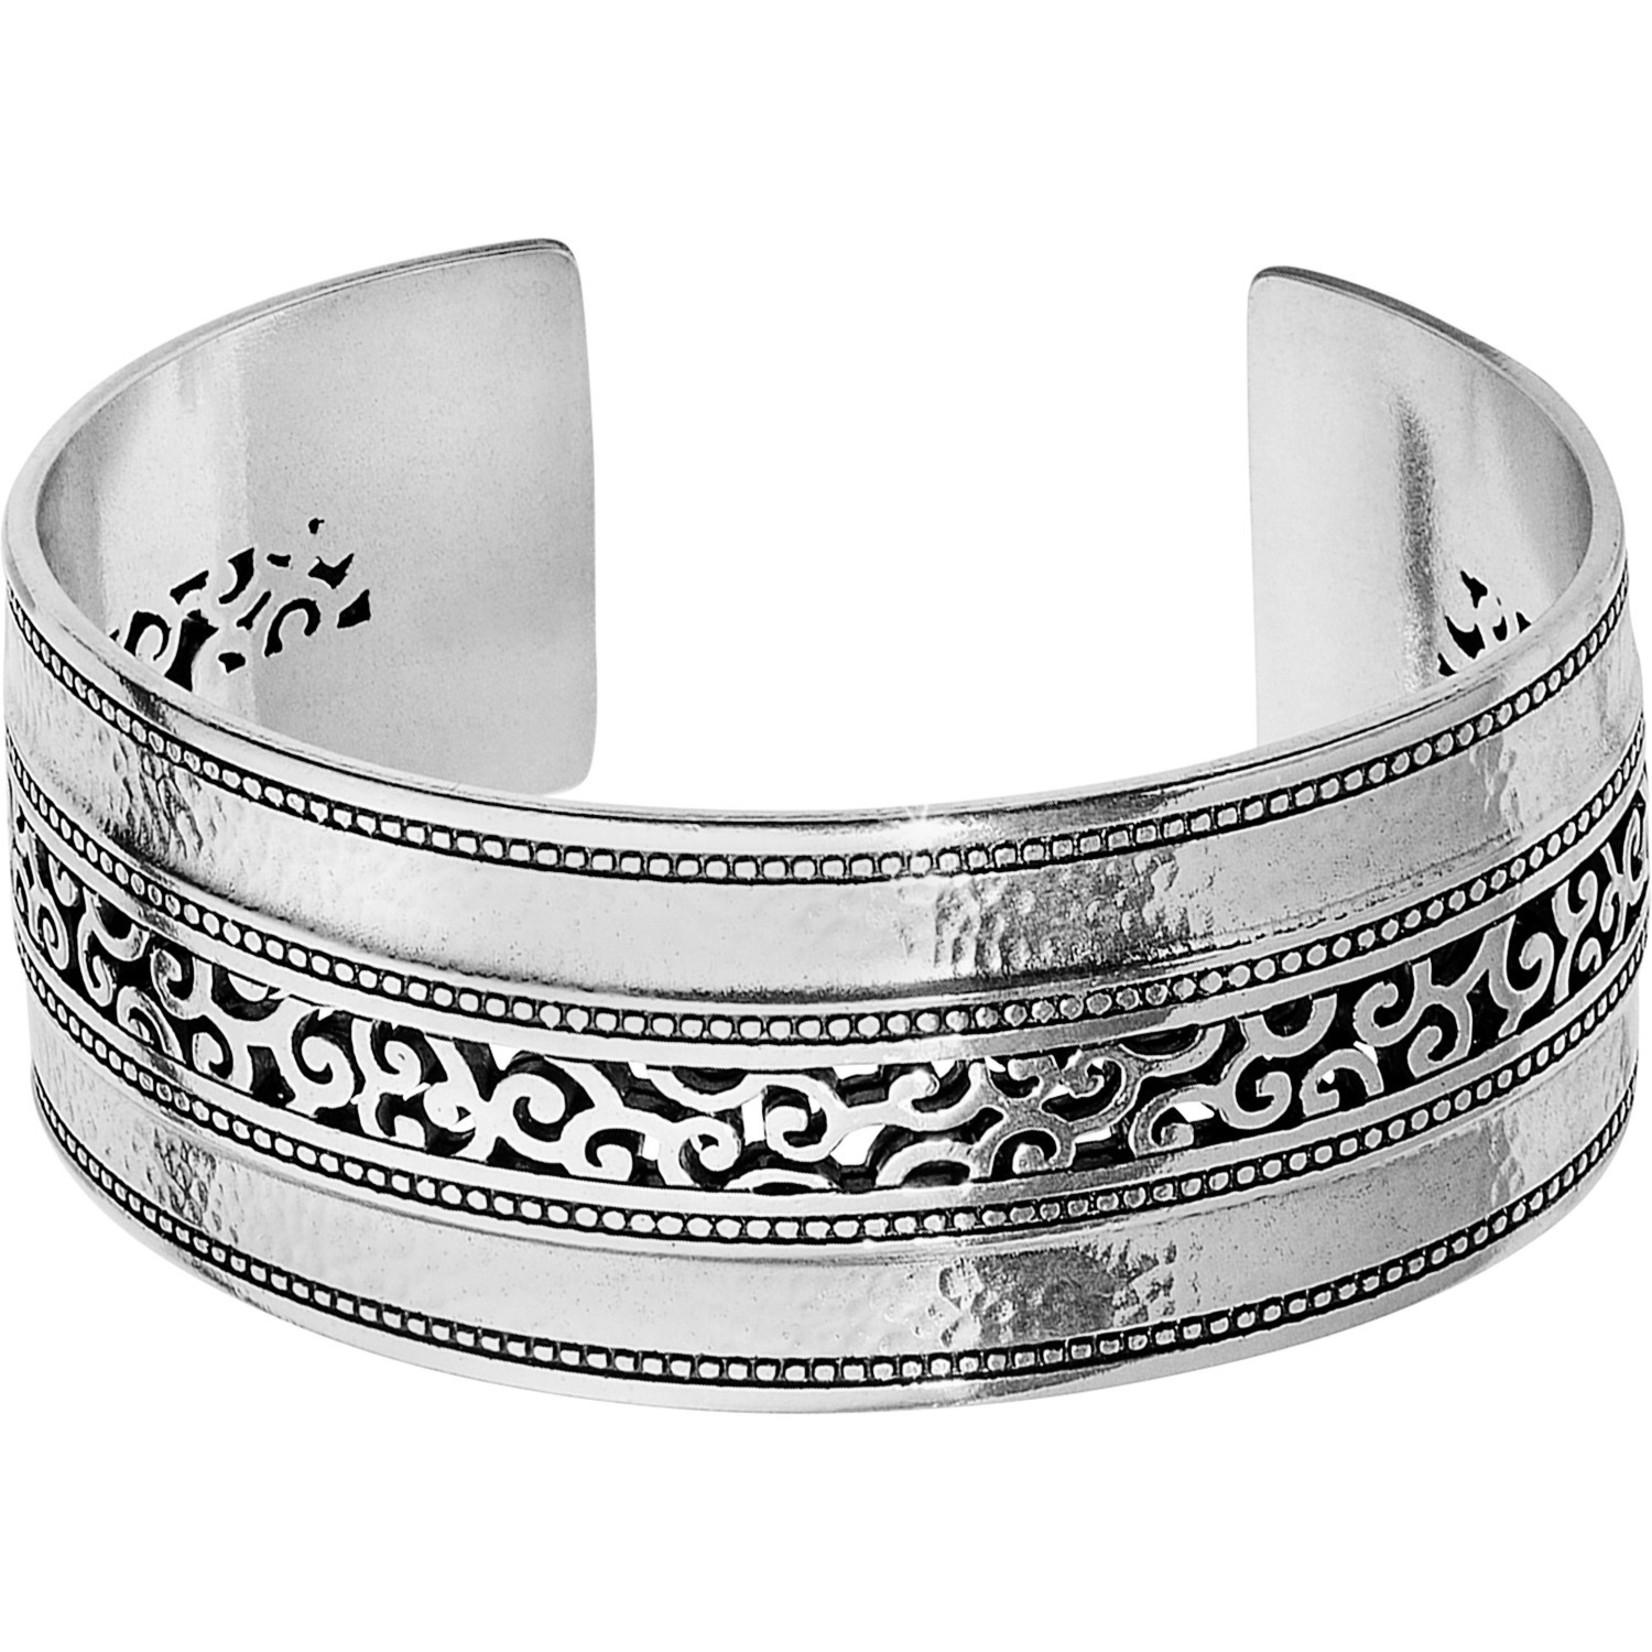 Brighton Mingle Cuff Bracelet